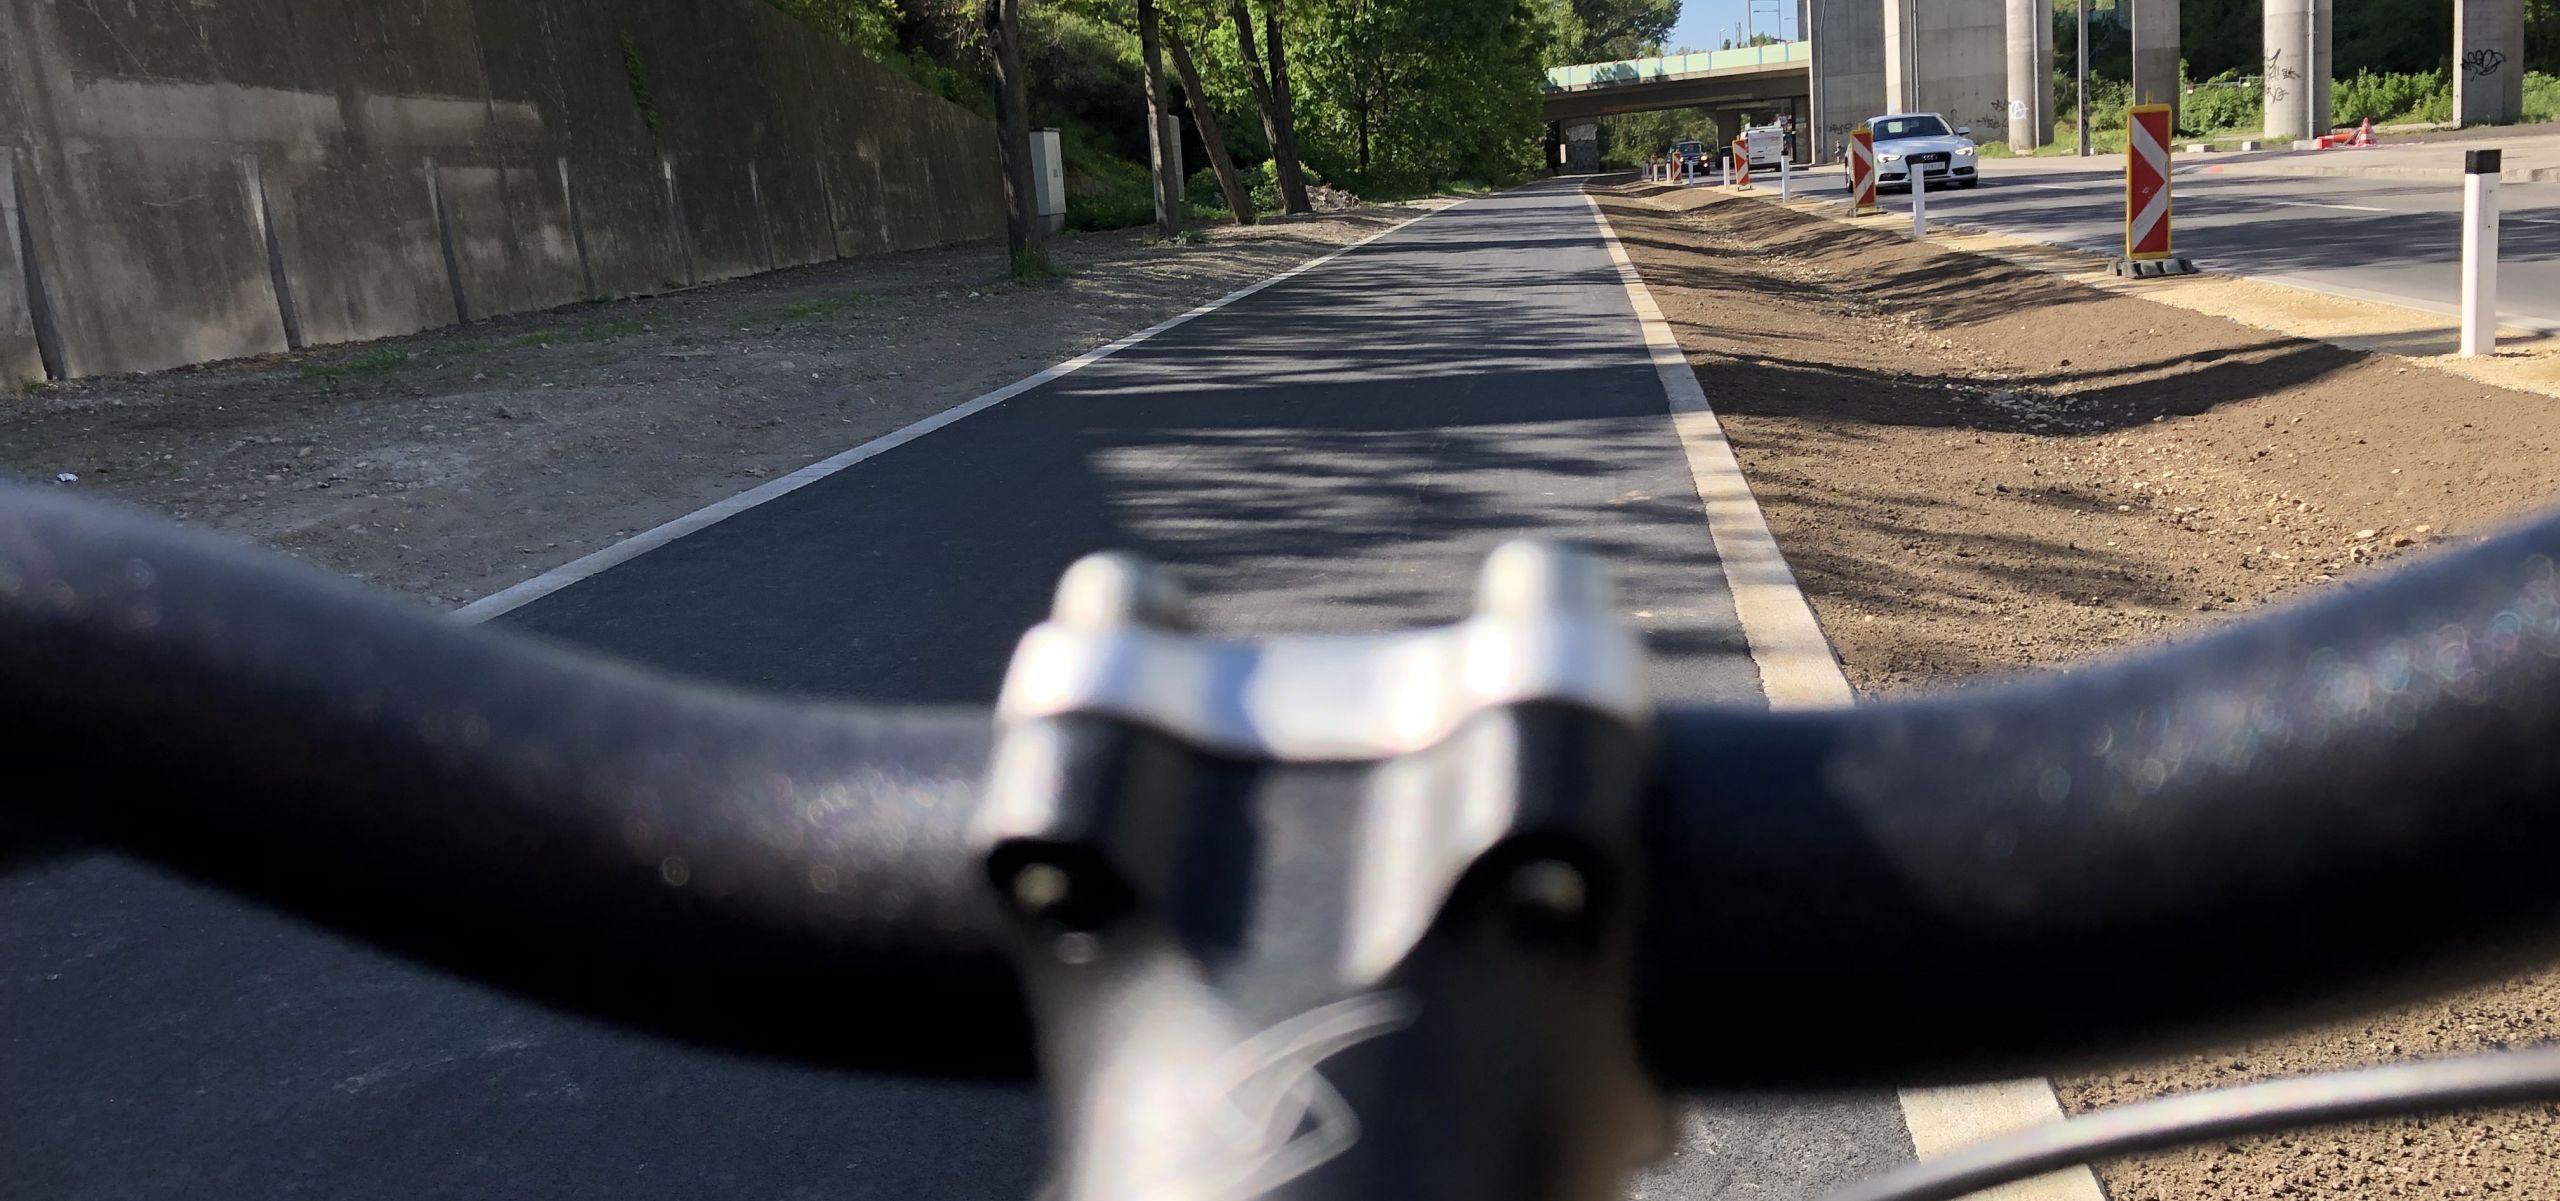 Radweg Kaisermühlenstraße über den Lenker eines Fahrrads hinweg fotografiert.